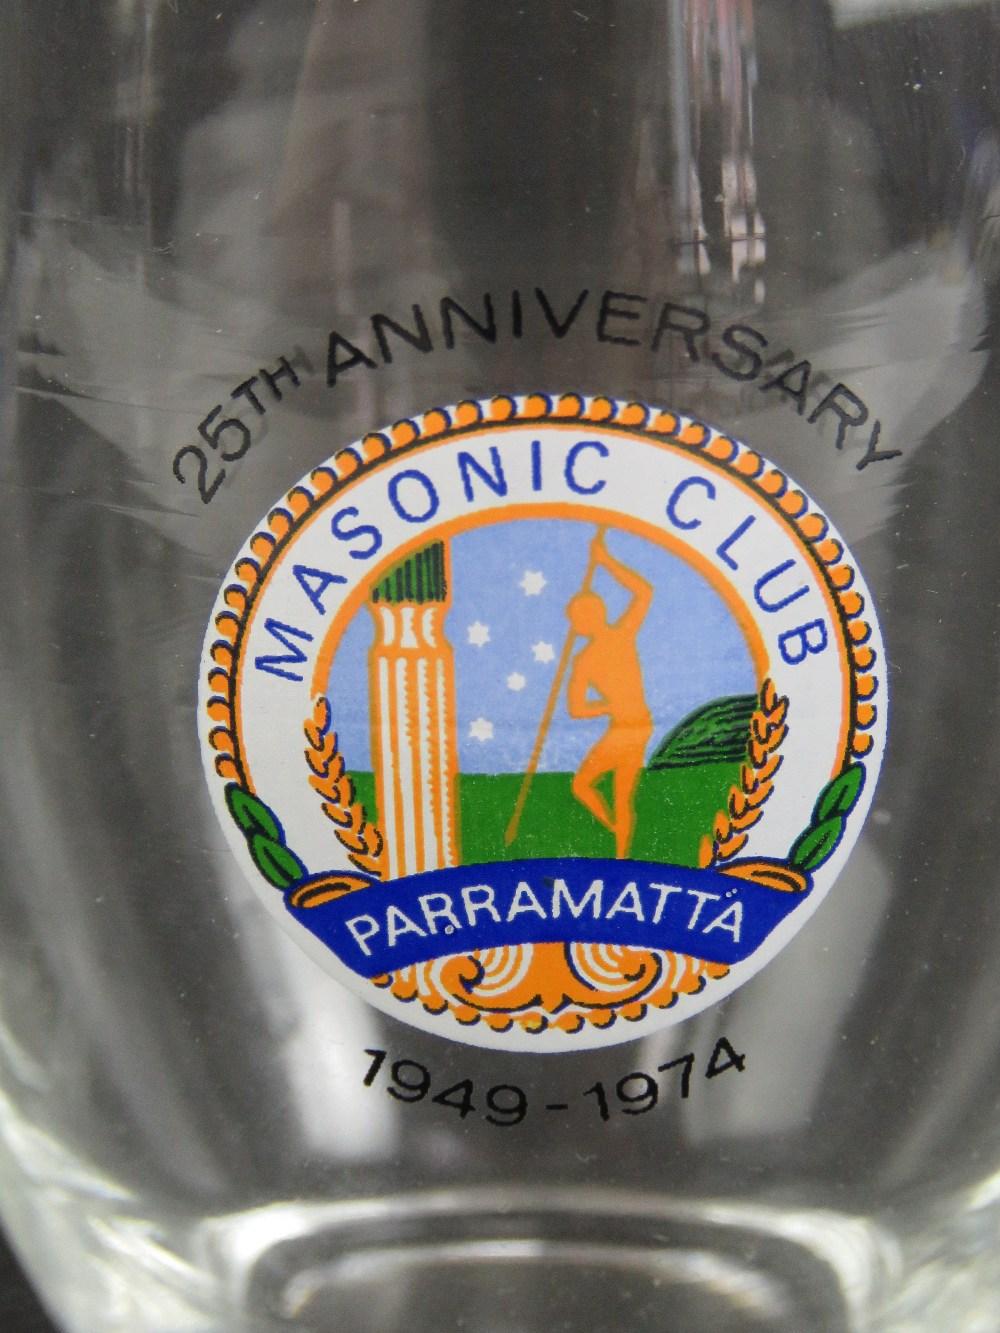 Lot 58 - Masonic; A quantity of Masonic mugs and glassware including 25th Anniversary, Ladies Night,